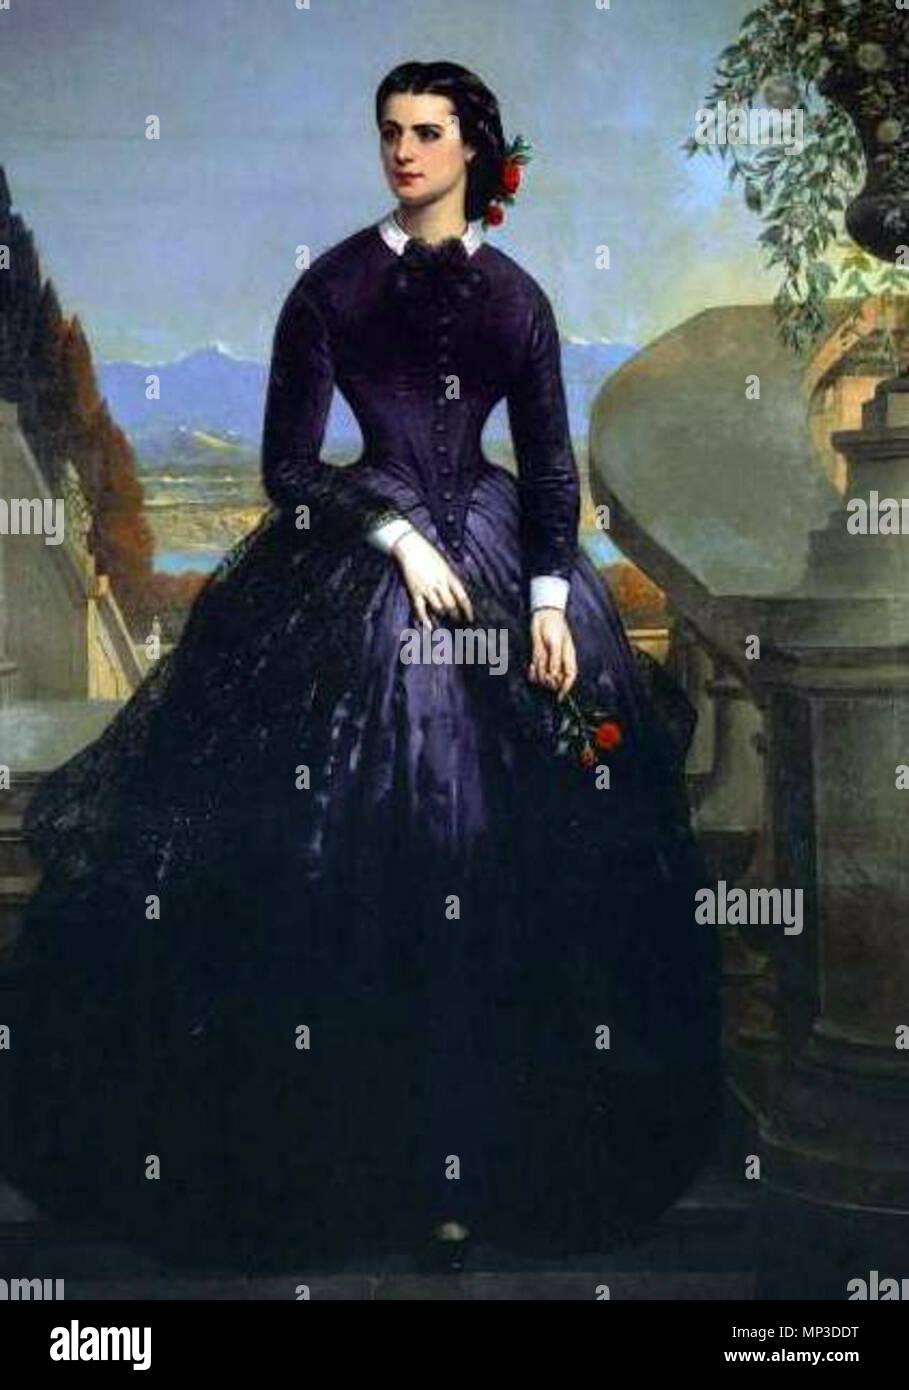 Retrato de Isidora Goyenechea. Retrato de la multimillonaria empresaria chilena del siglo XIX Isidora Goyenechea realizado en París junto con el de su marido Luis Cousiño . antes de 1873. 676 Isidora Goyenechea Imagen De Stock